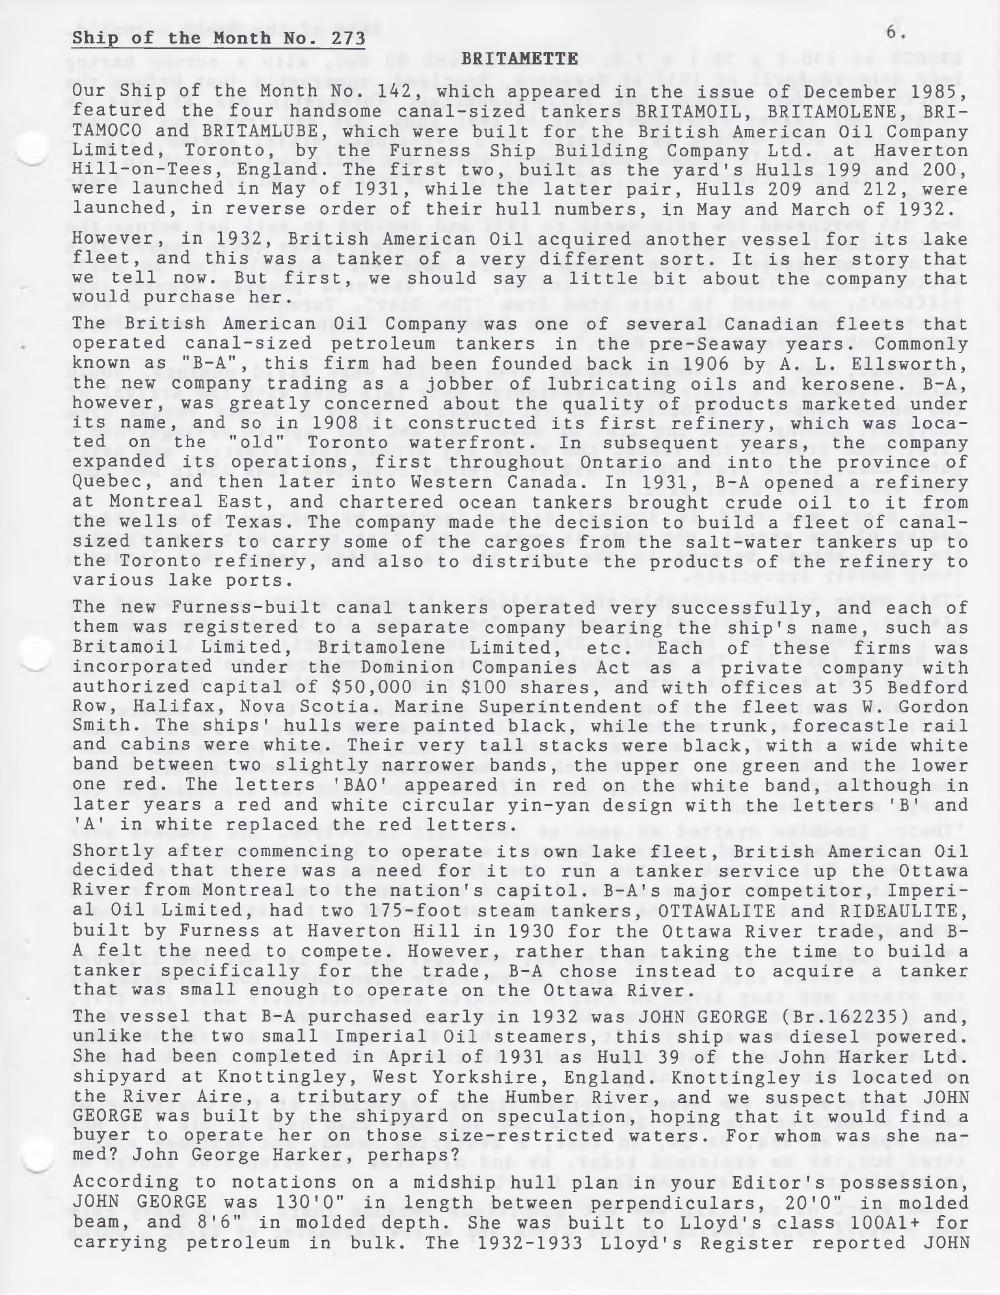 Scanner, v. 35, no. 4 (January 2003)